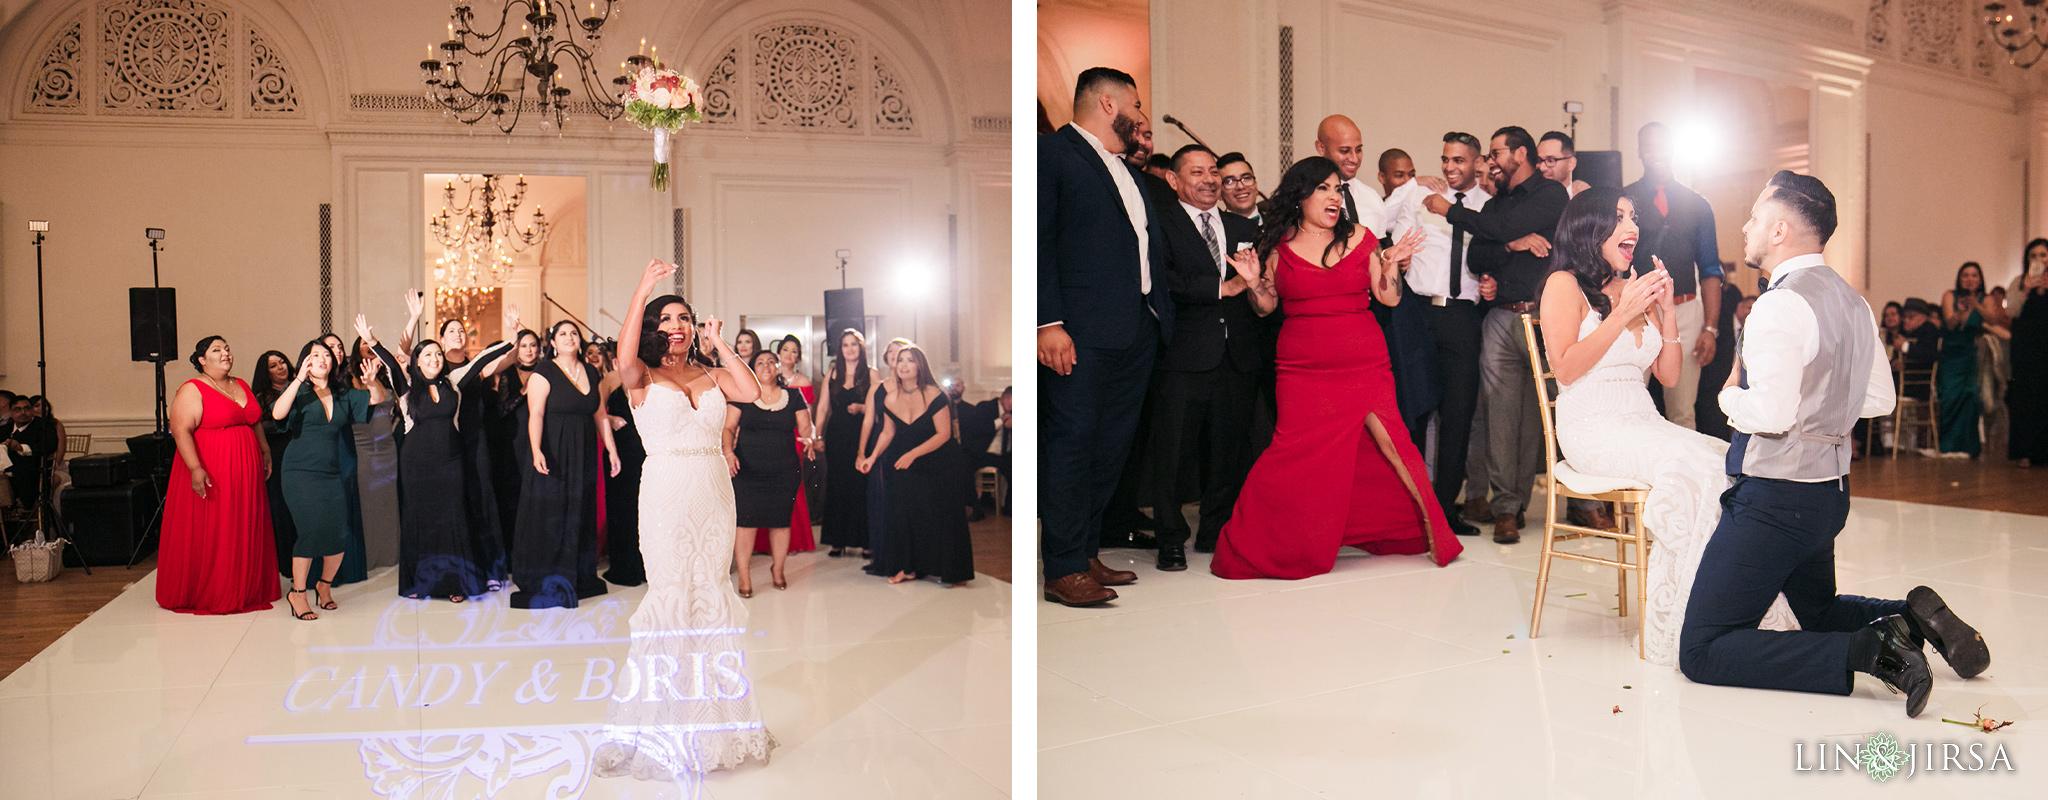 0804 Alexandria Ballroom Los Angeles County Wedding Photography